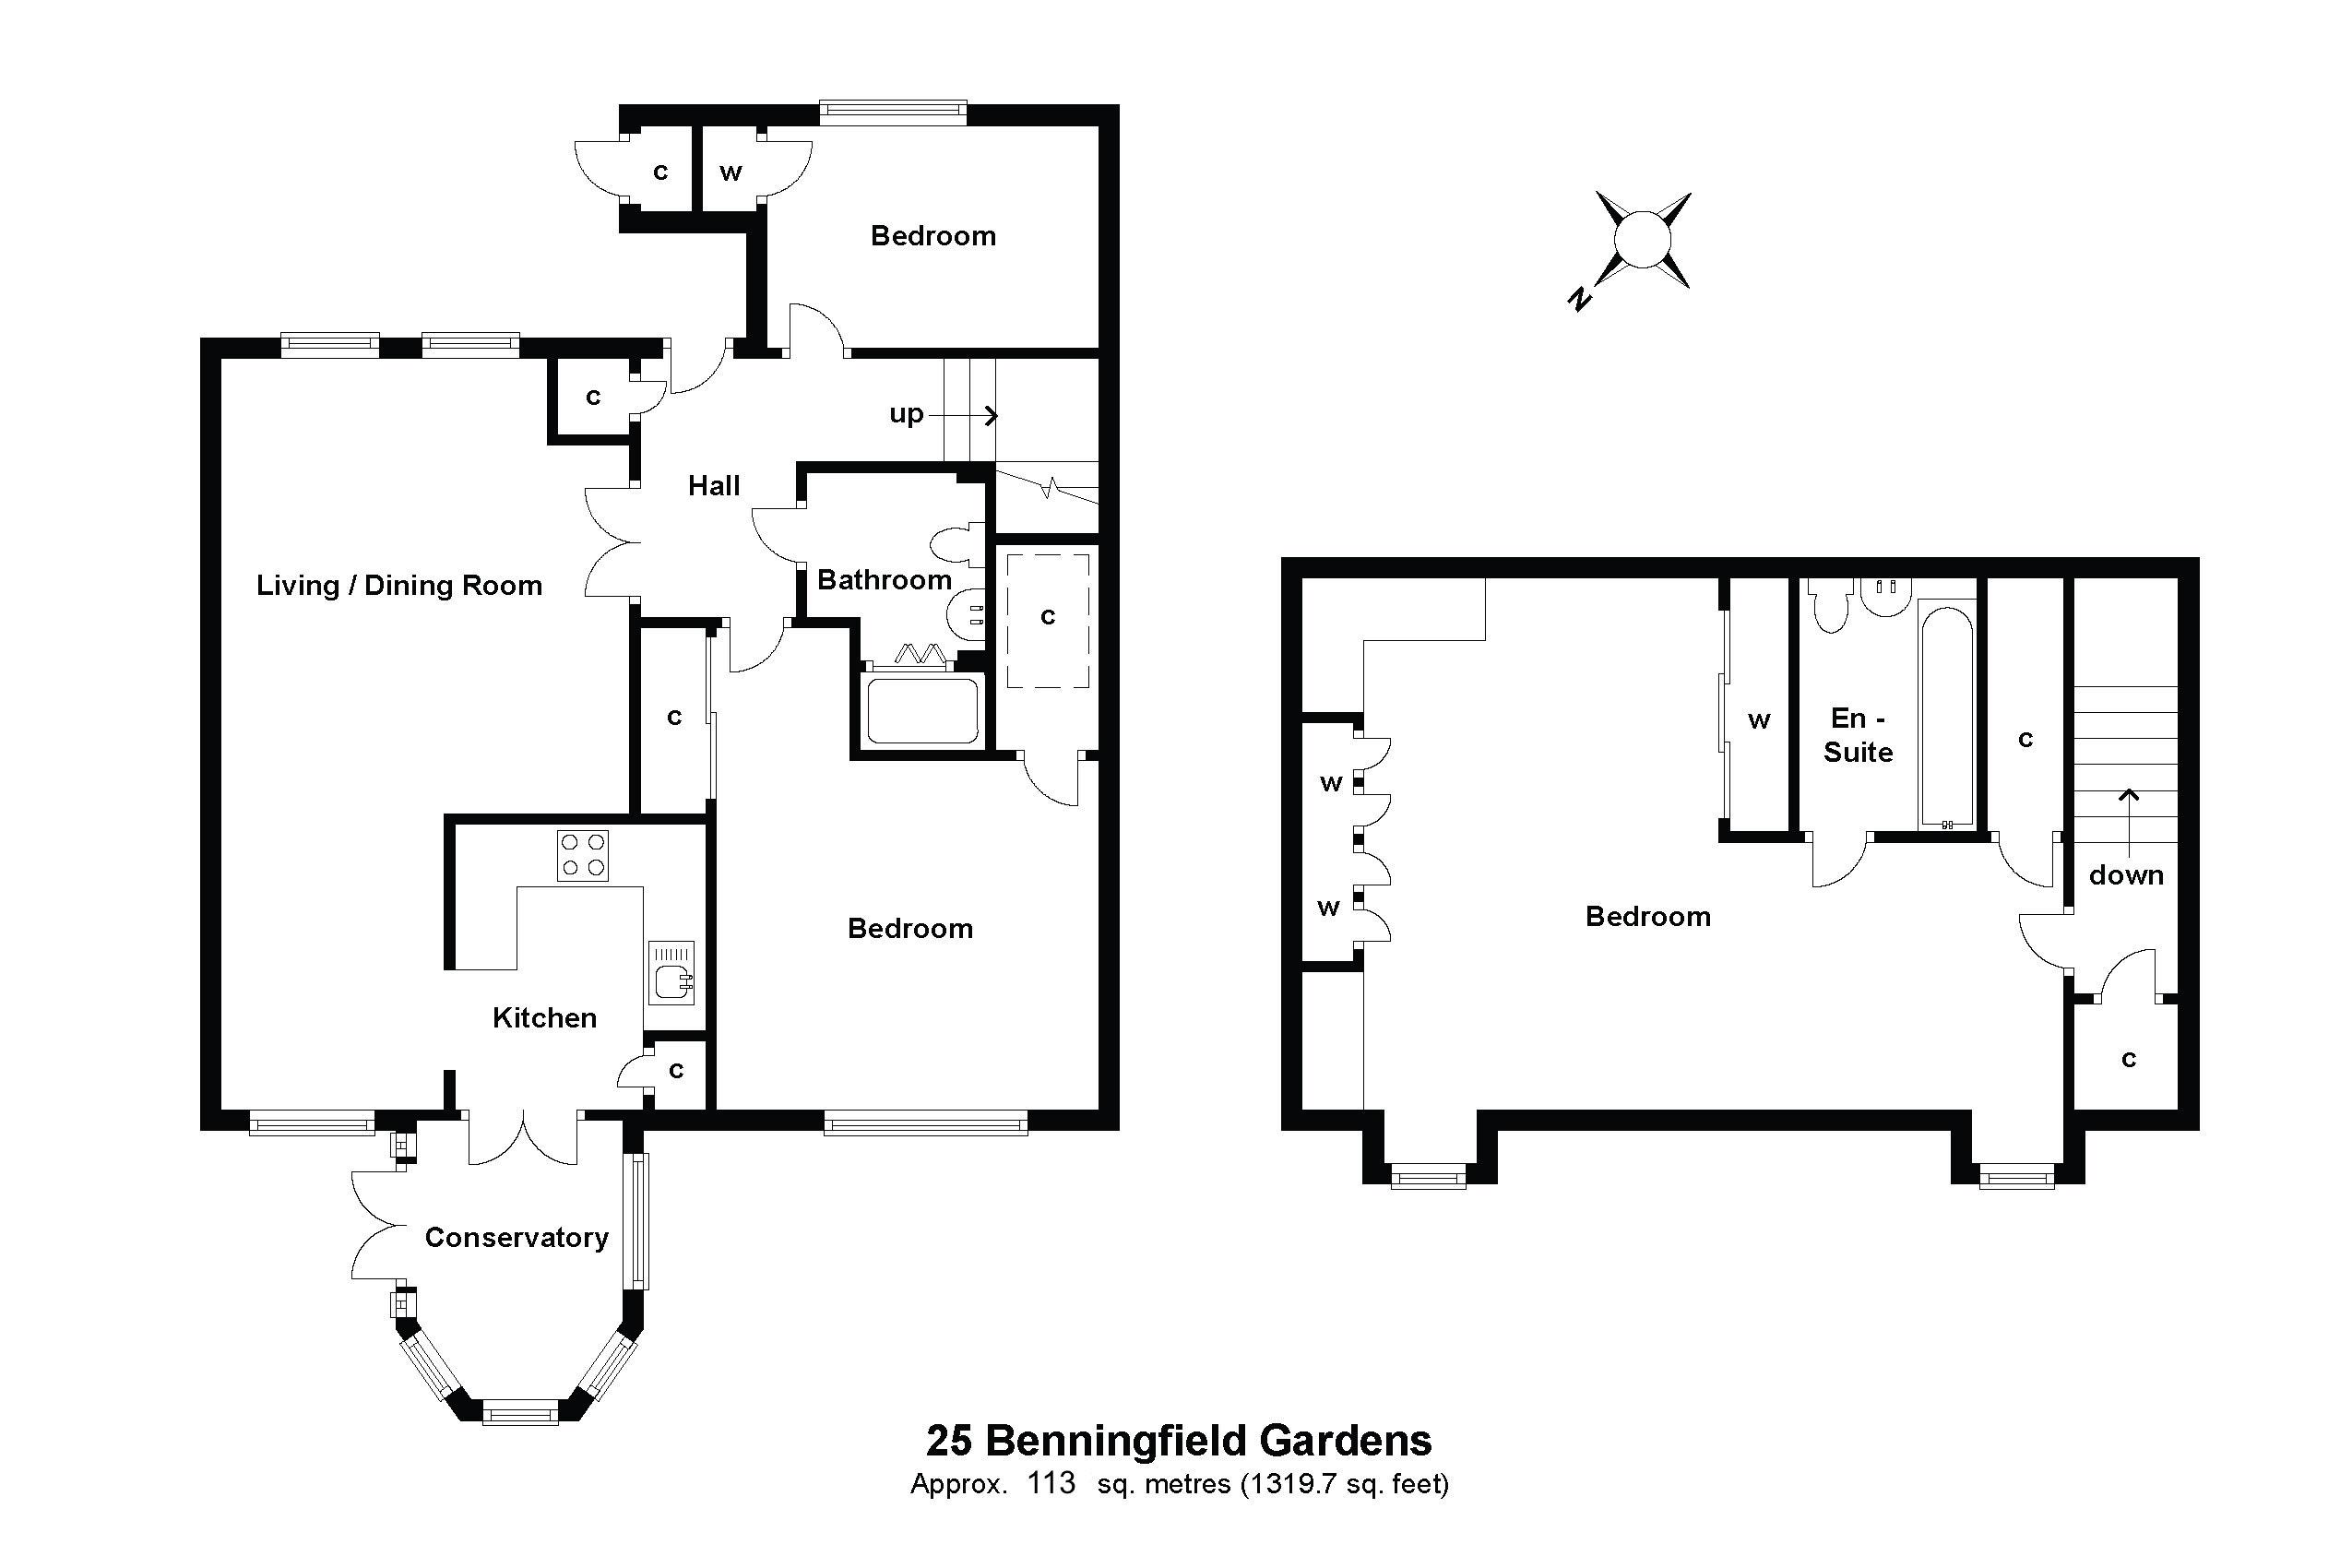 25 Benningfield Gardens Floorplan